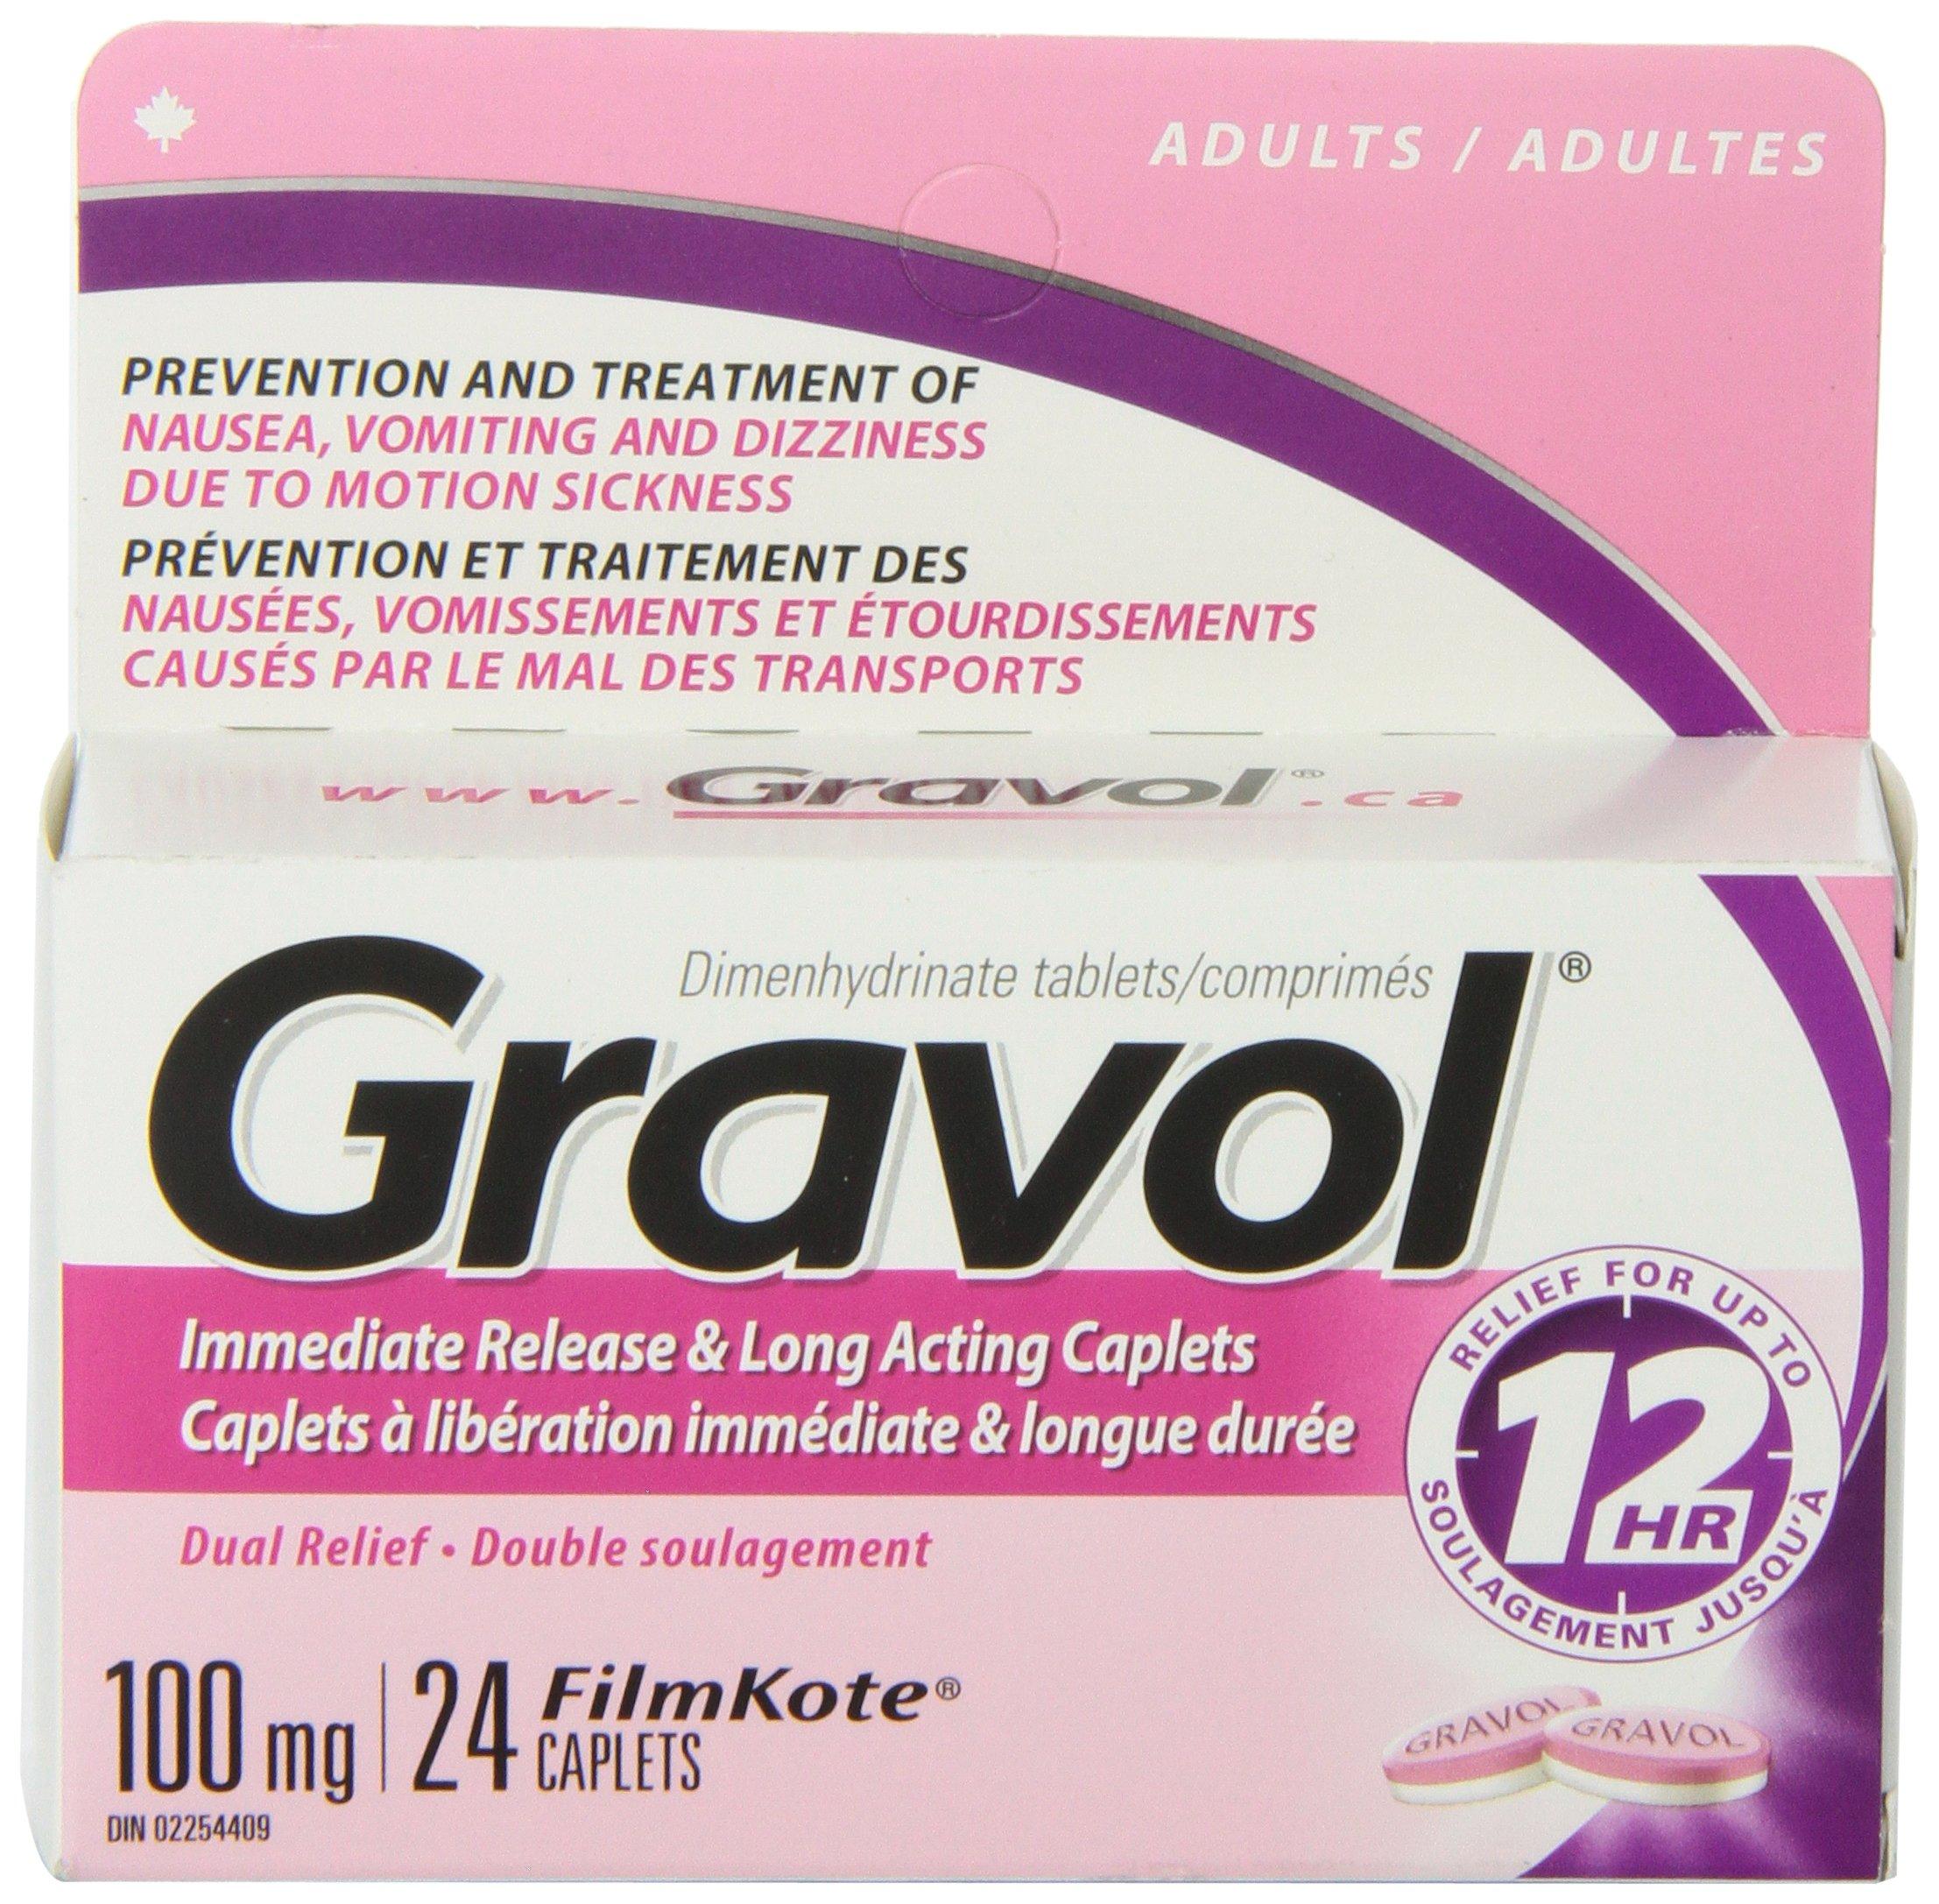 Dual Relief 12 Hour Long Lasting GRAVOL (24 caplets) Antinauseant for NAUSEA, VOMITING, DIZZINESS & MOTION SICKNESS by Gravol (Image #4)